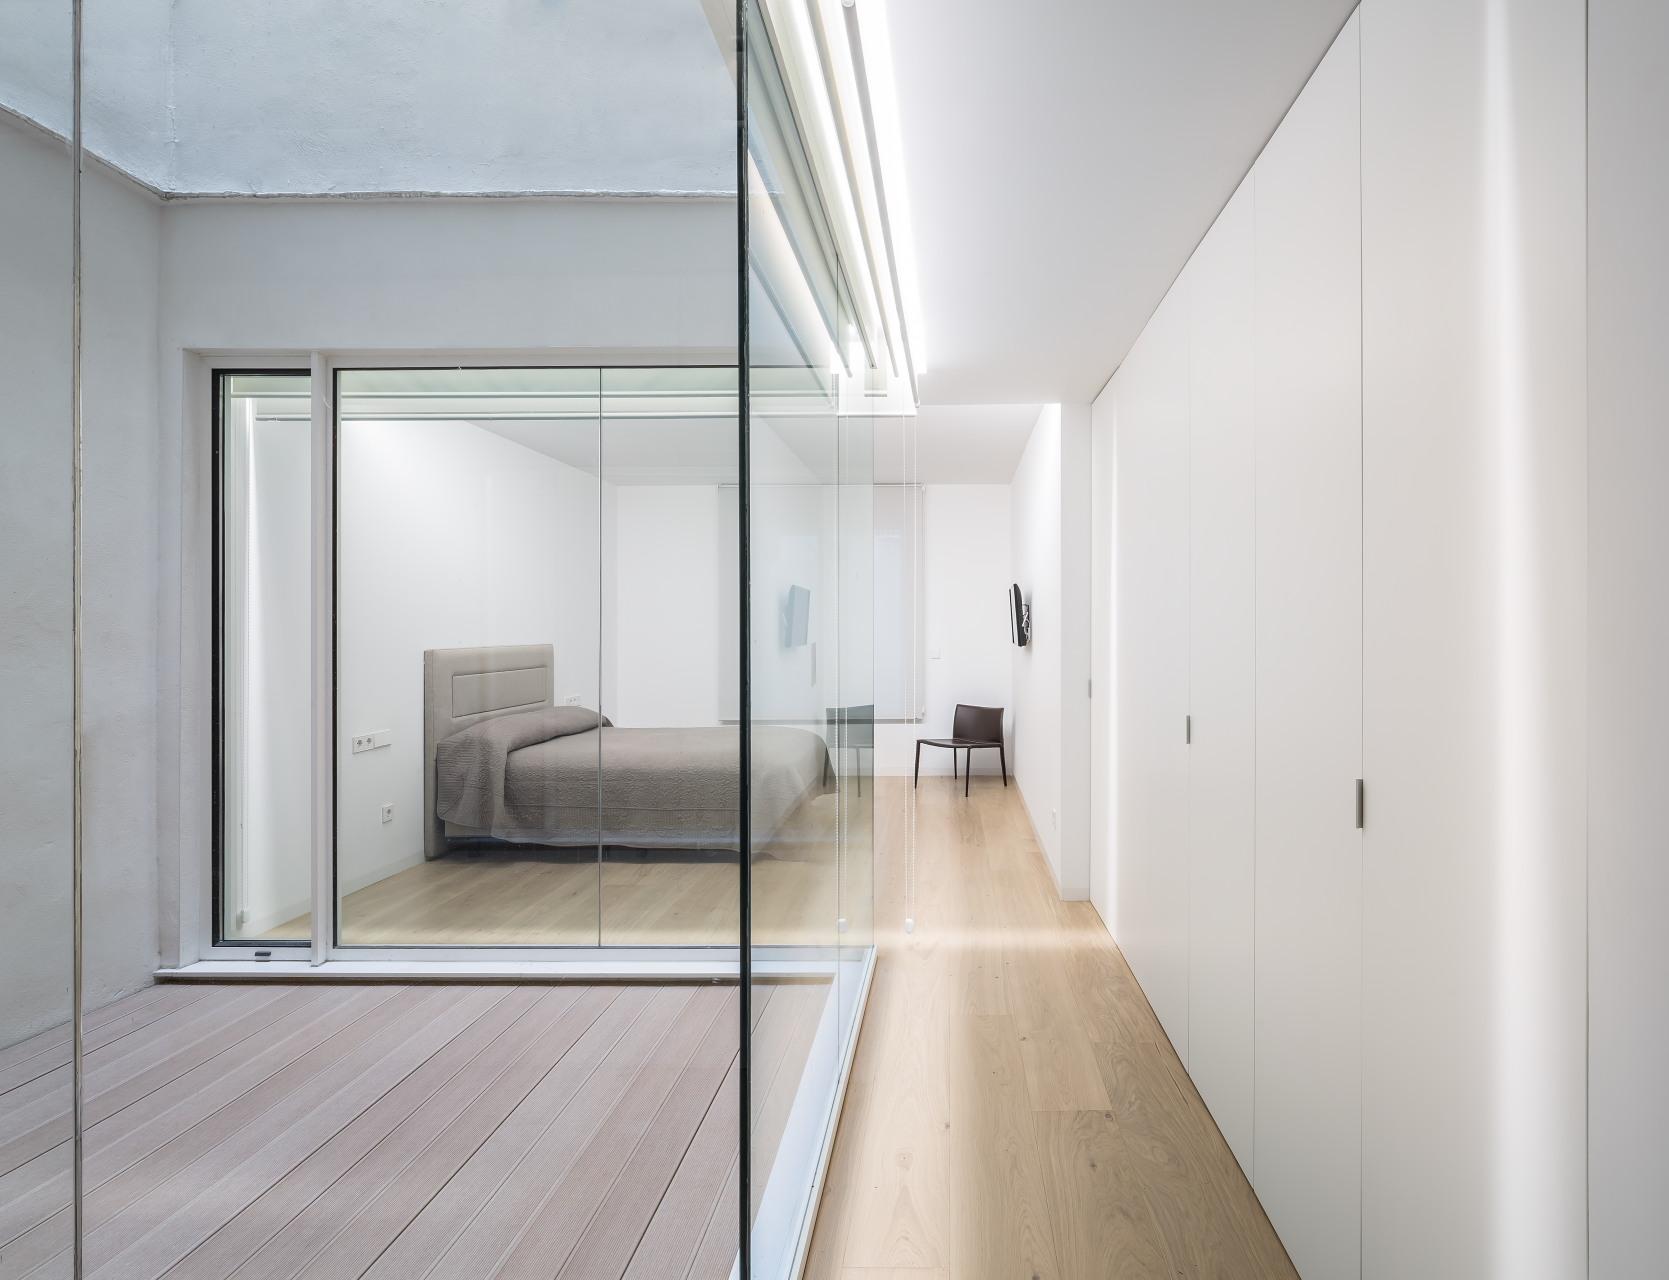 fotografia-arquitectura-interiorismo-valencia-german-cabo-gallardo-llopis-bfm-edificatoria-turia02 (17)